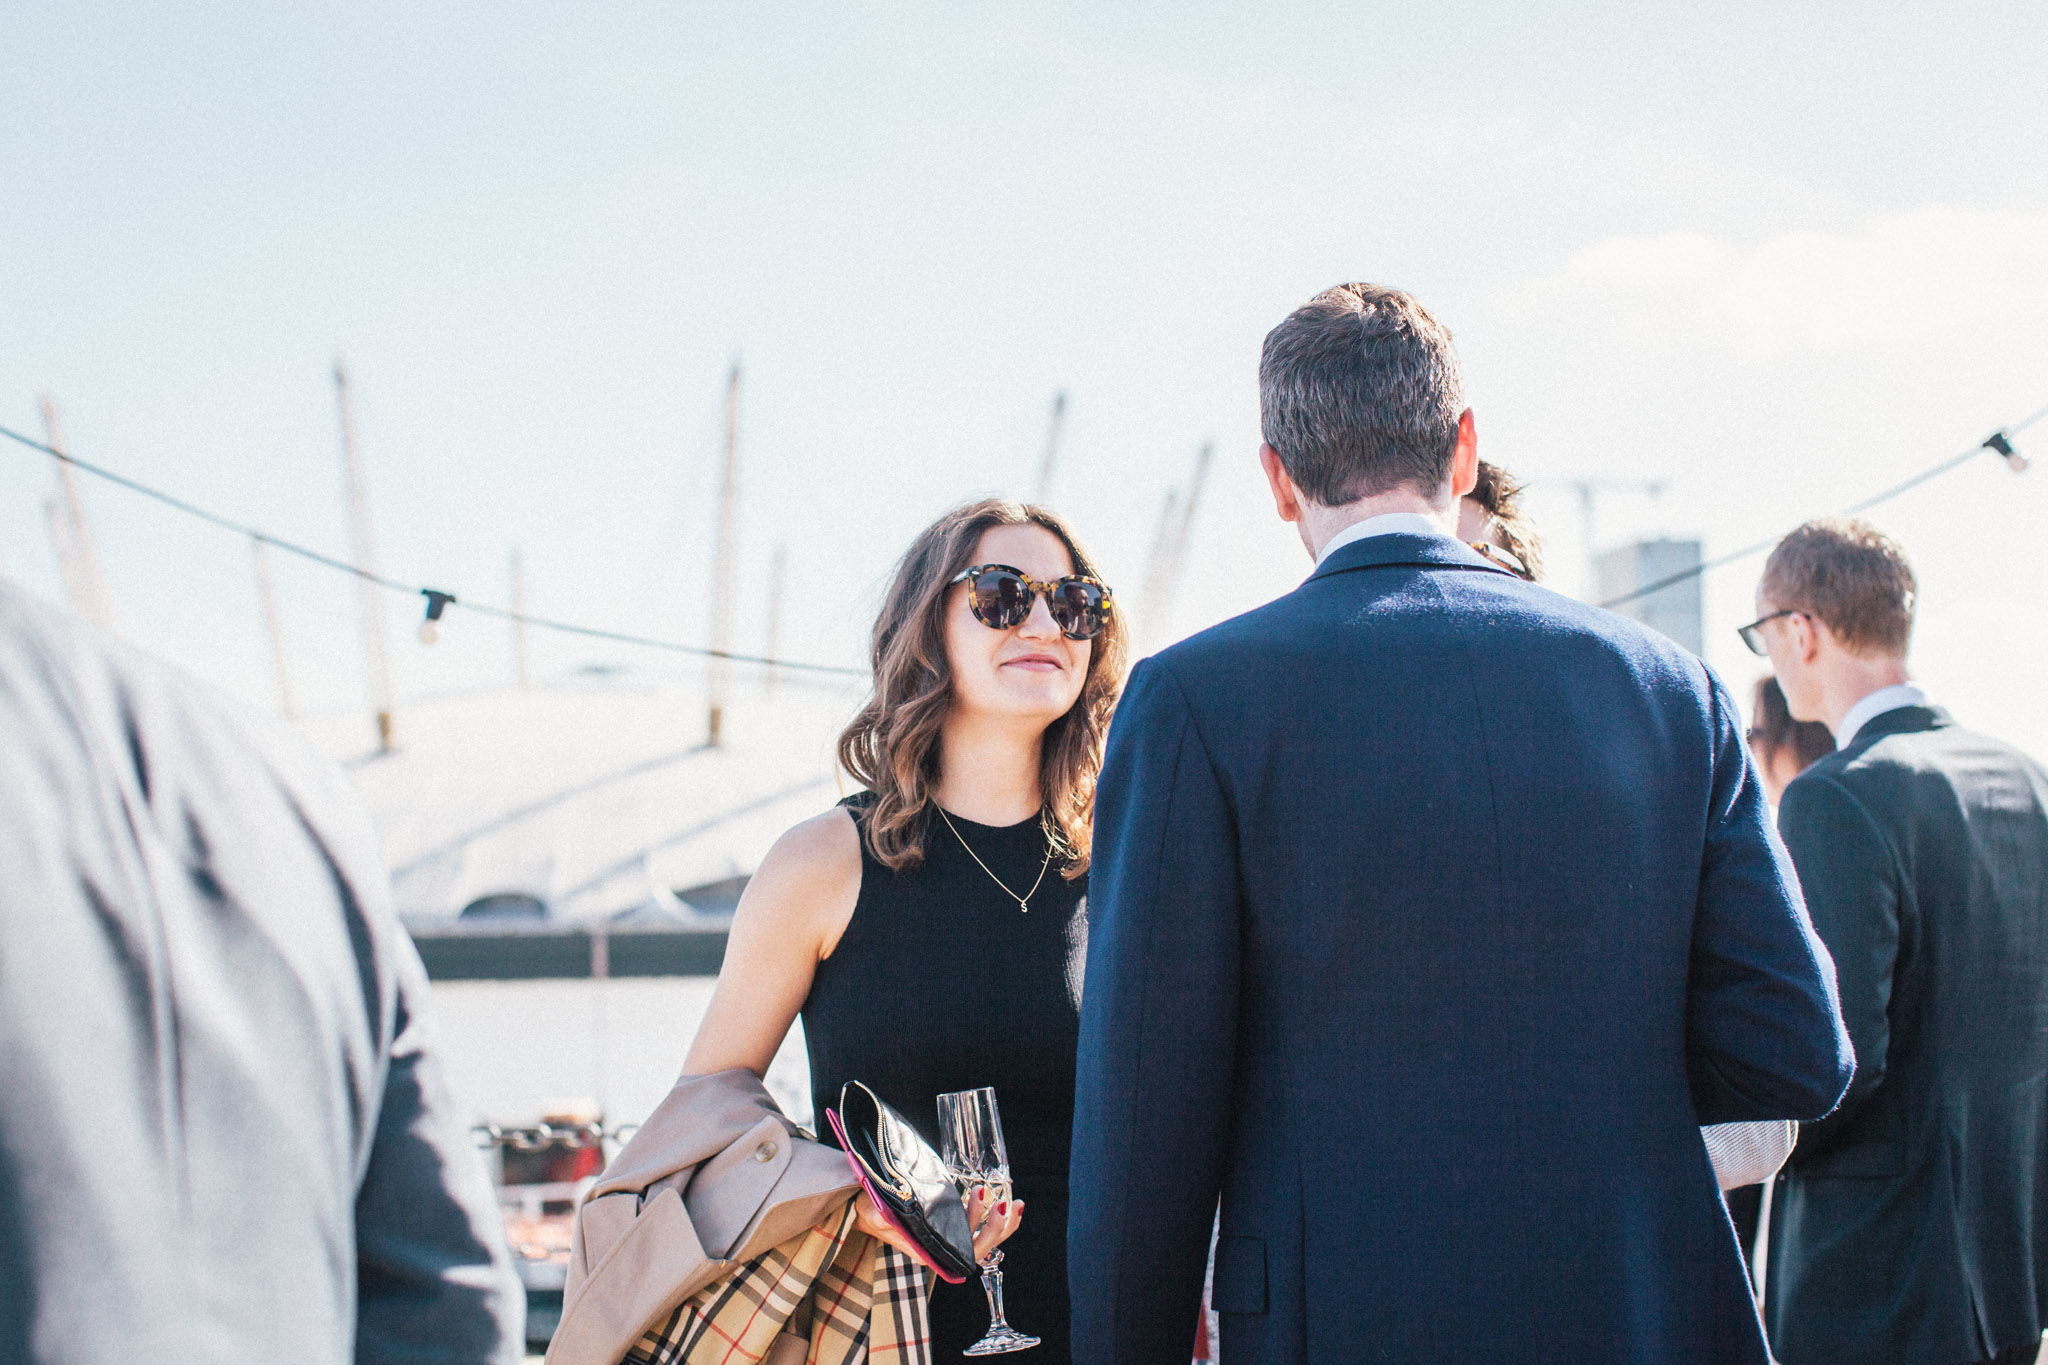 trinity_buoy_wharf_hackney_town_hall_wedding_394.jpg